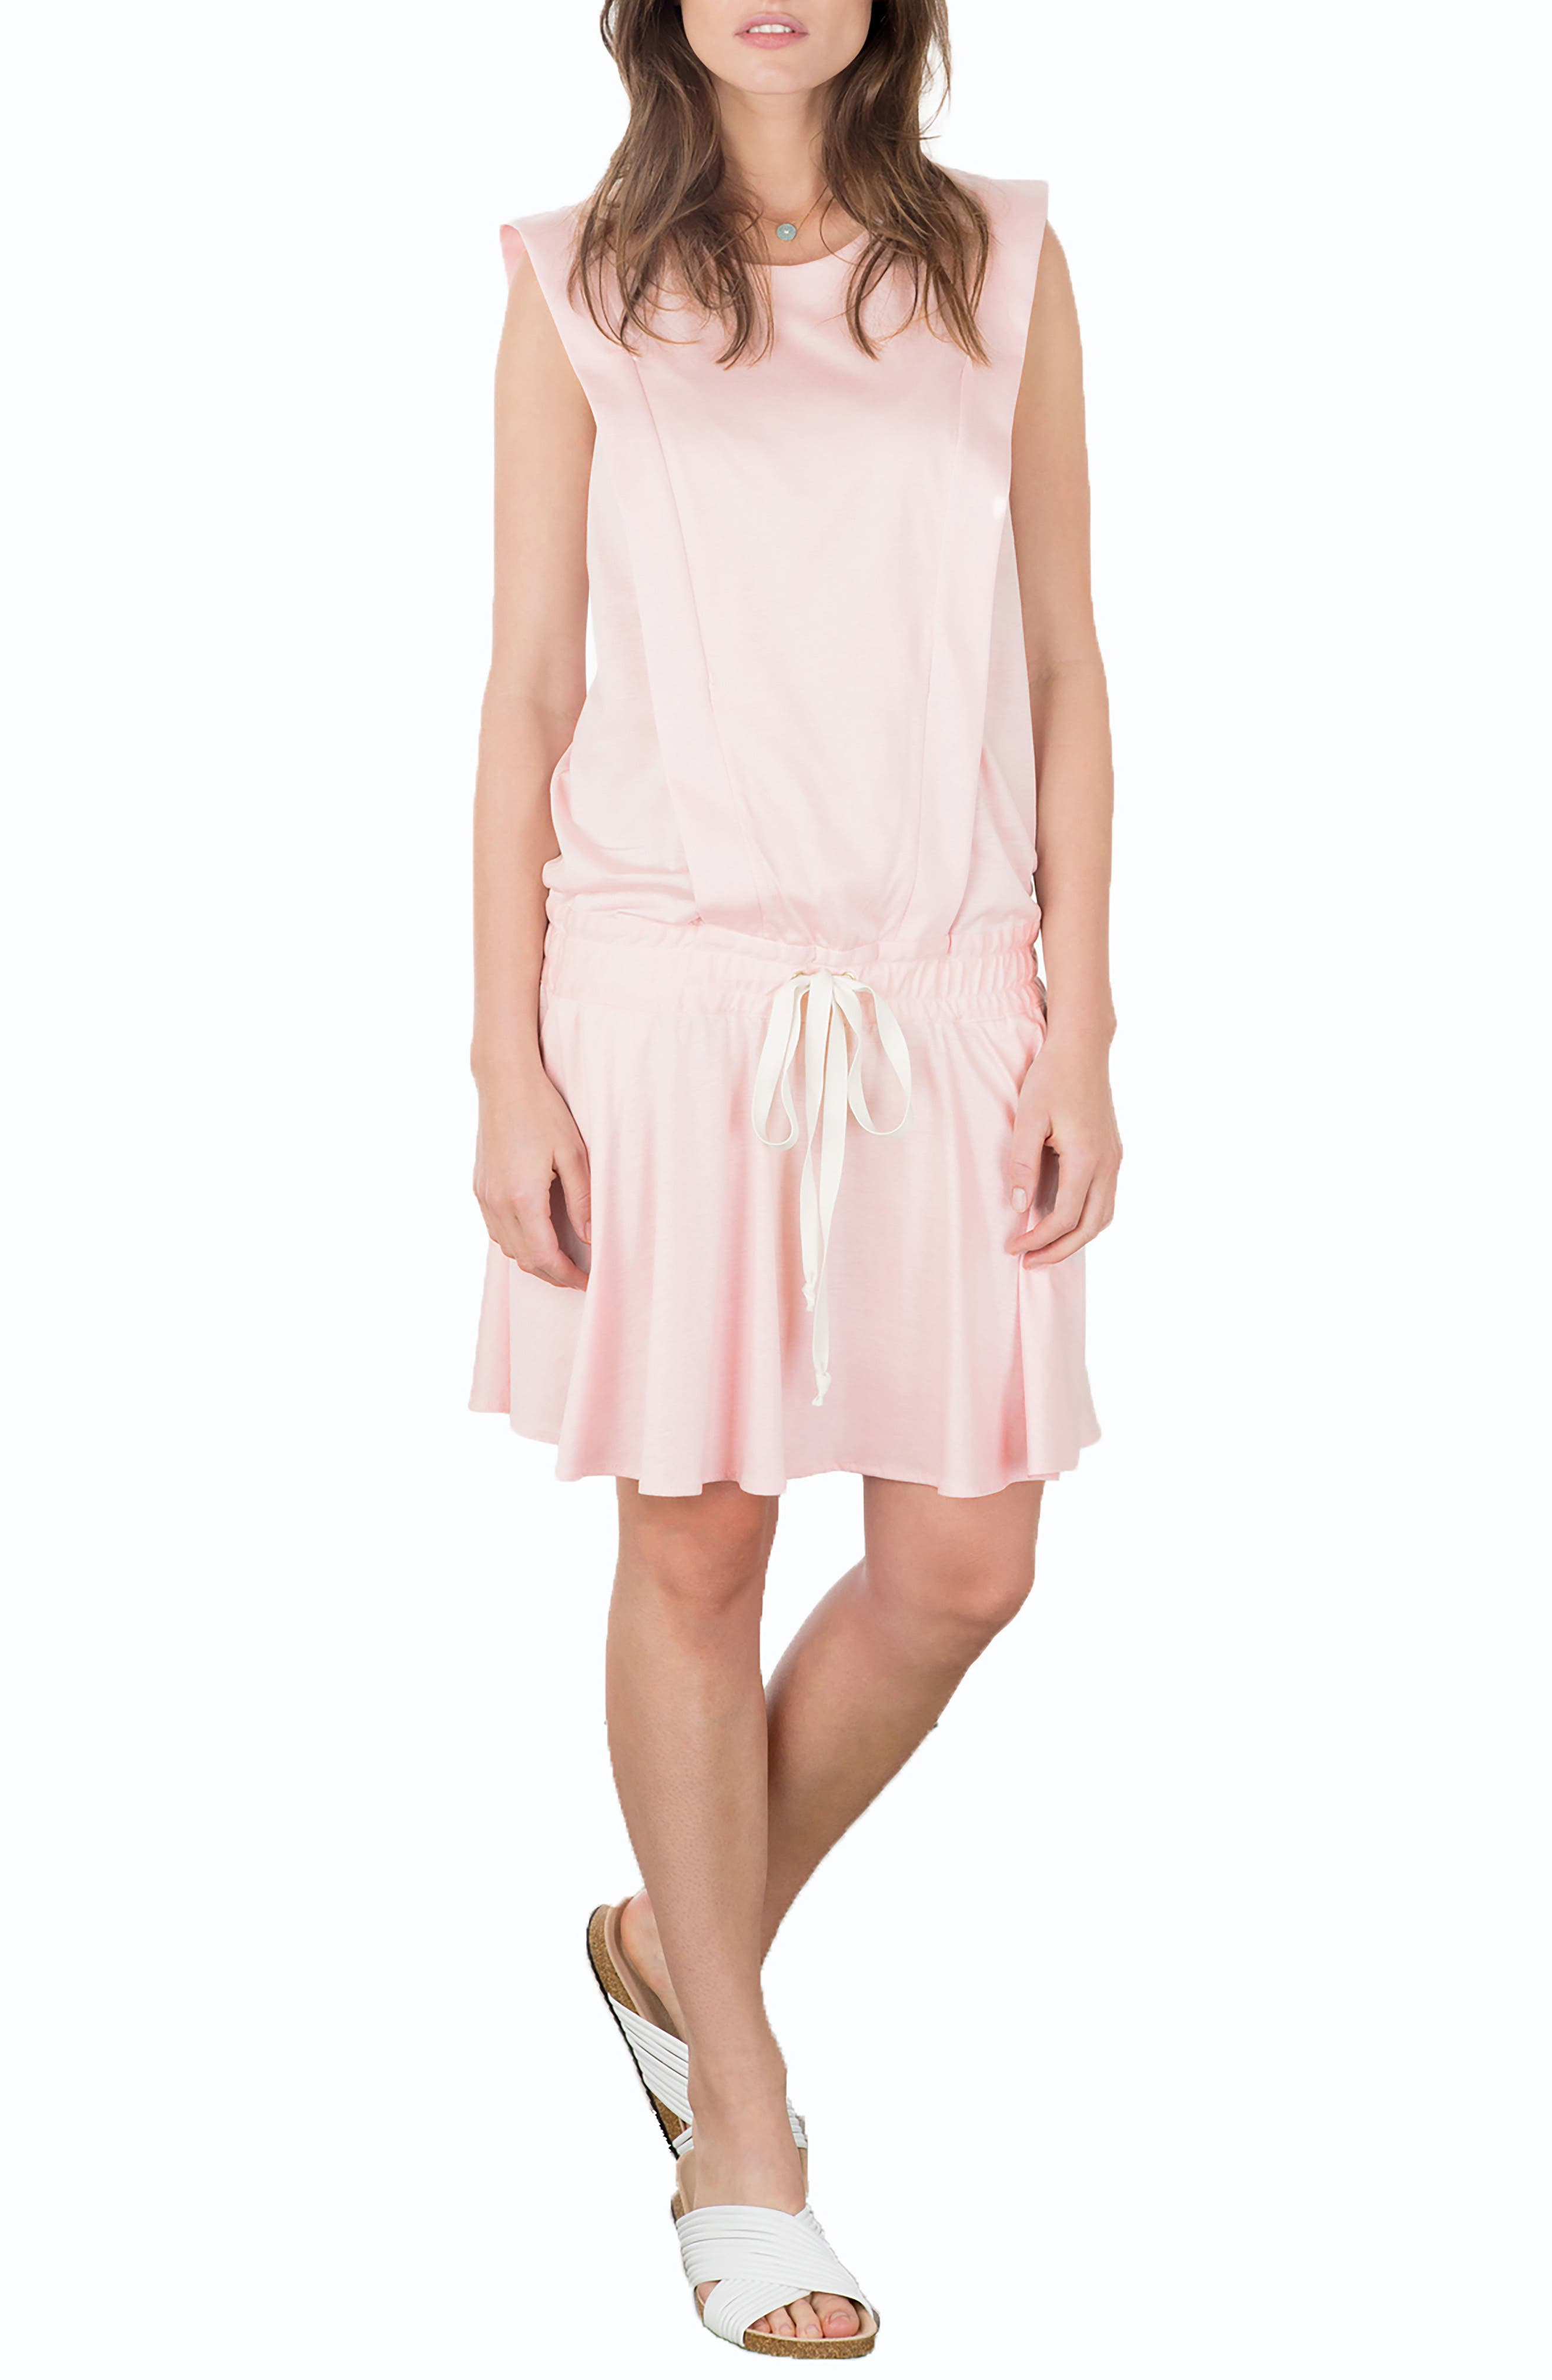 Irene Drop Waist Nursing Dress,                         Main,                         color, 650